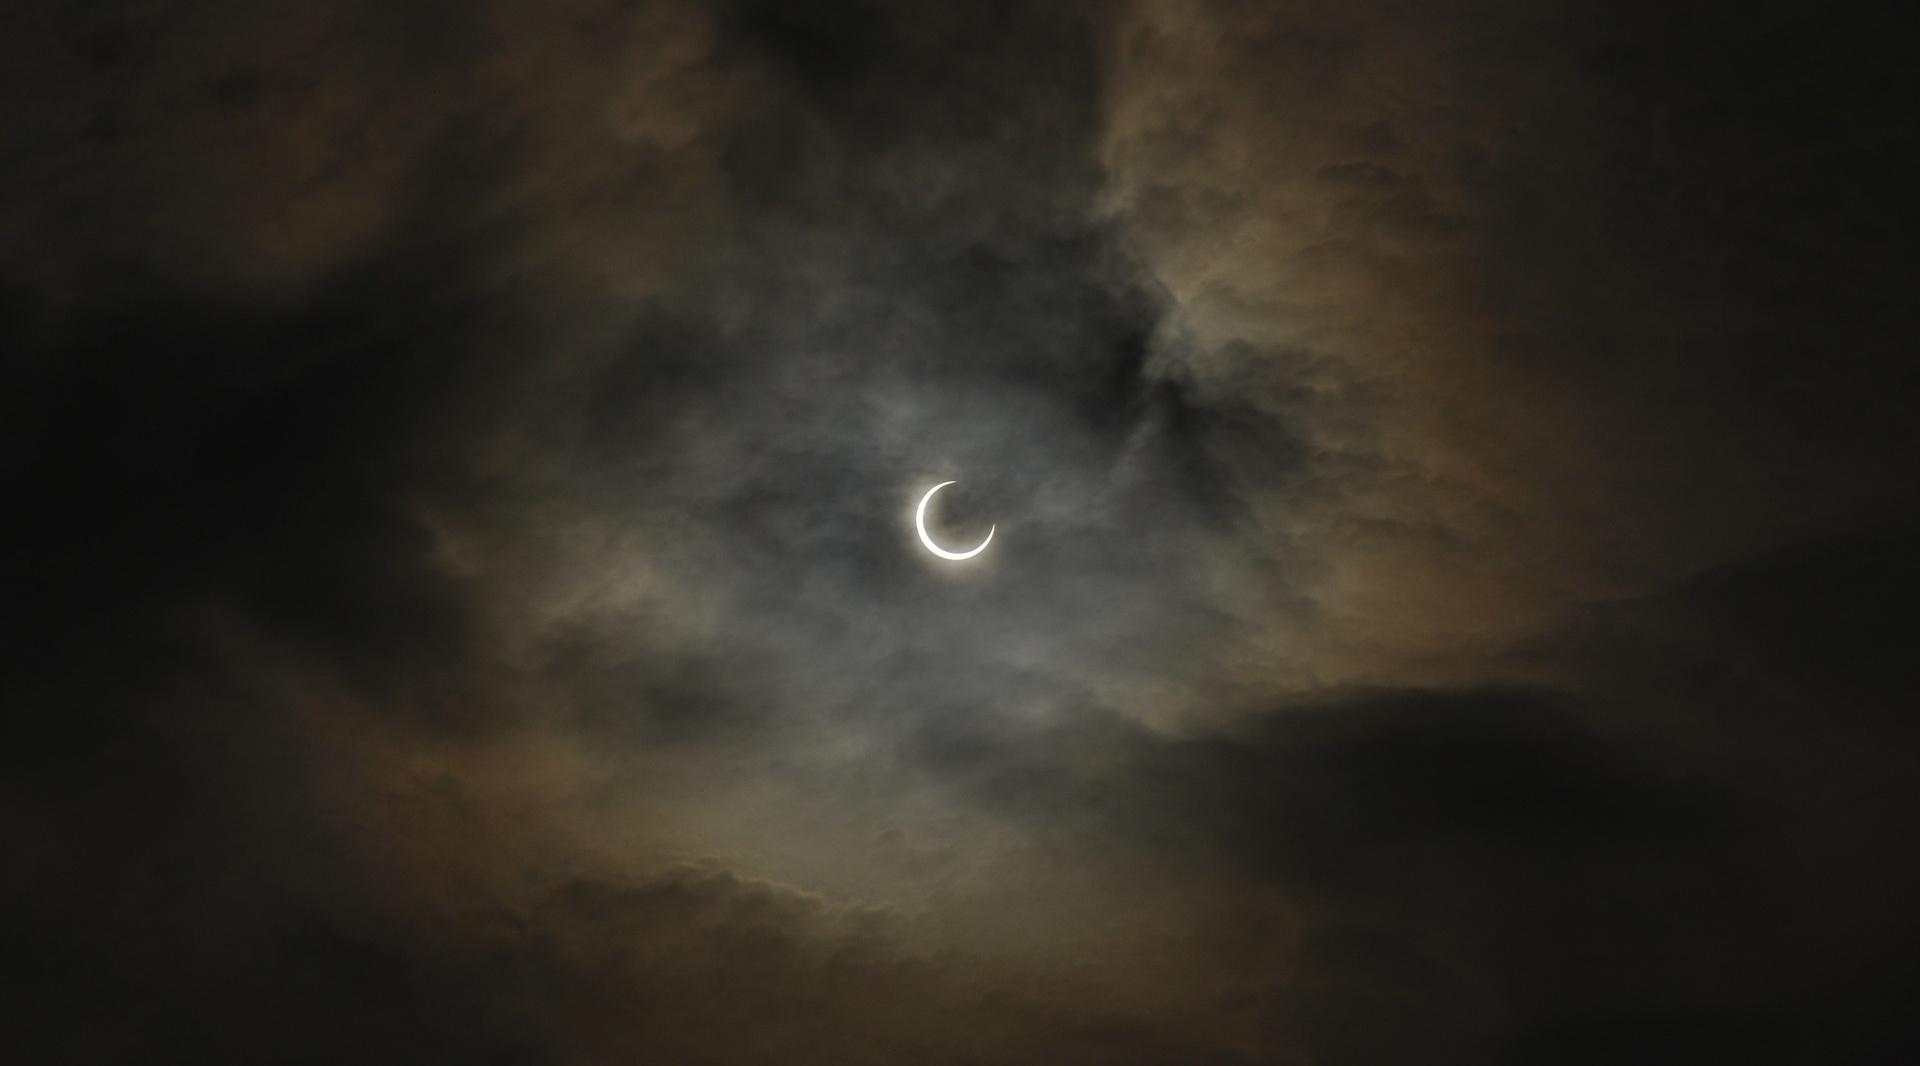 total-solar-eclipse-95547_1920.jpg